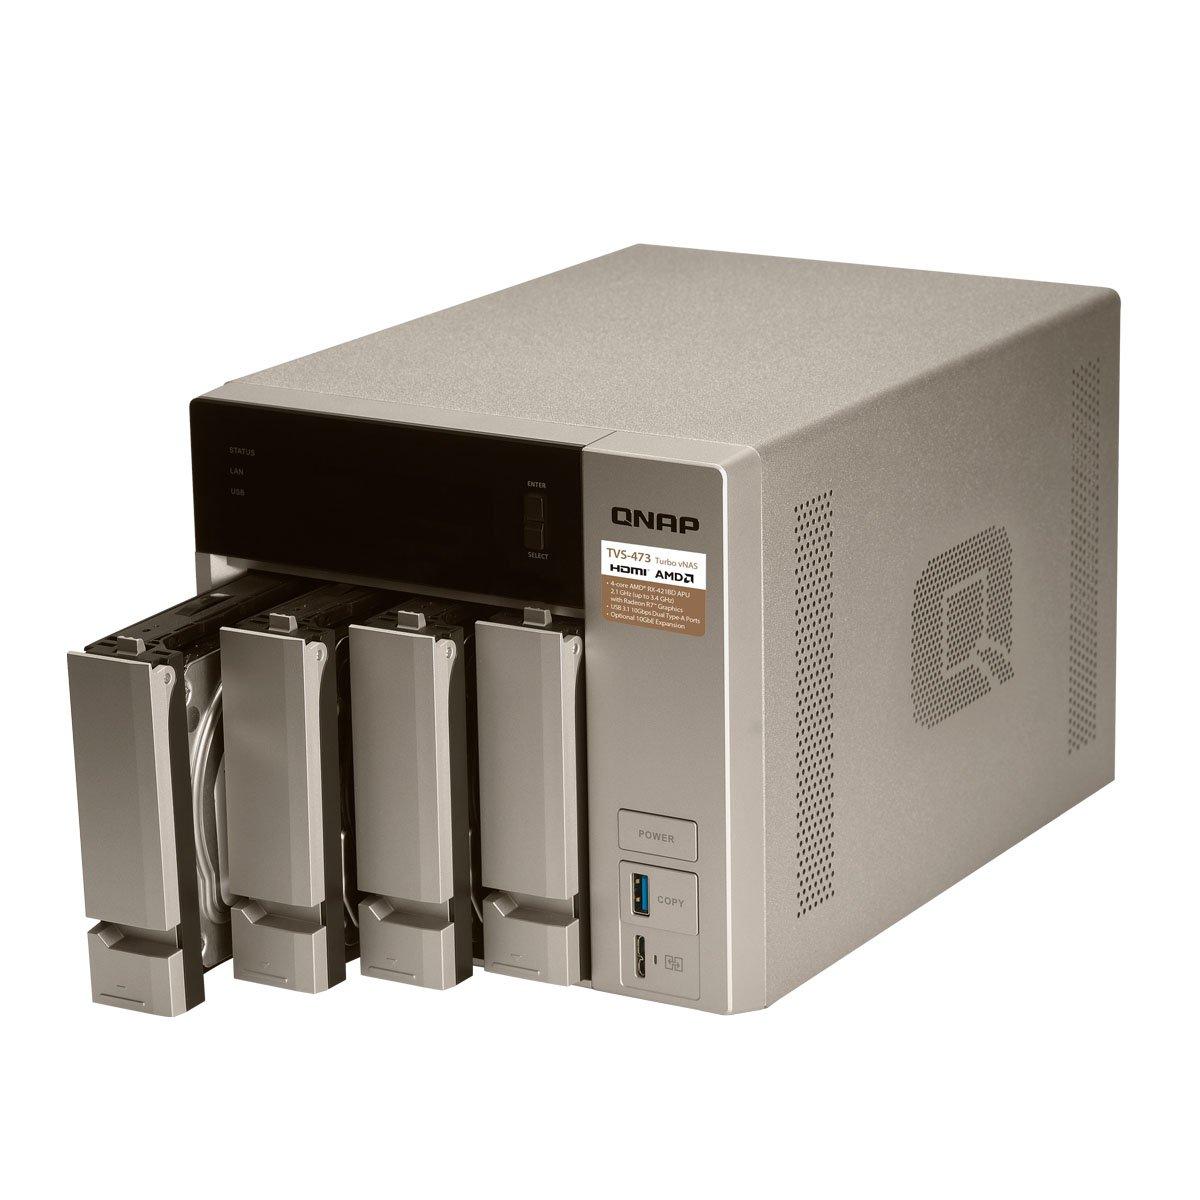 Qnap TVS-473-8G-US 4-bay NAS/iSCSI IP-SAN, AMD R series Quad-core 2.1GHz, 8GB RAM, 10G-ready by QNAP (Image #2)